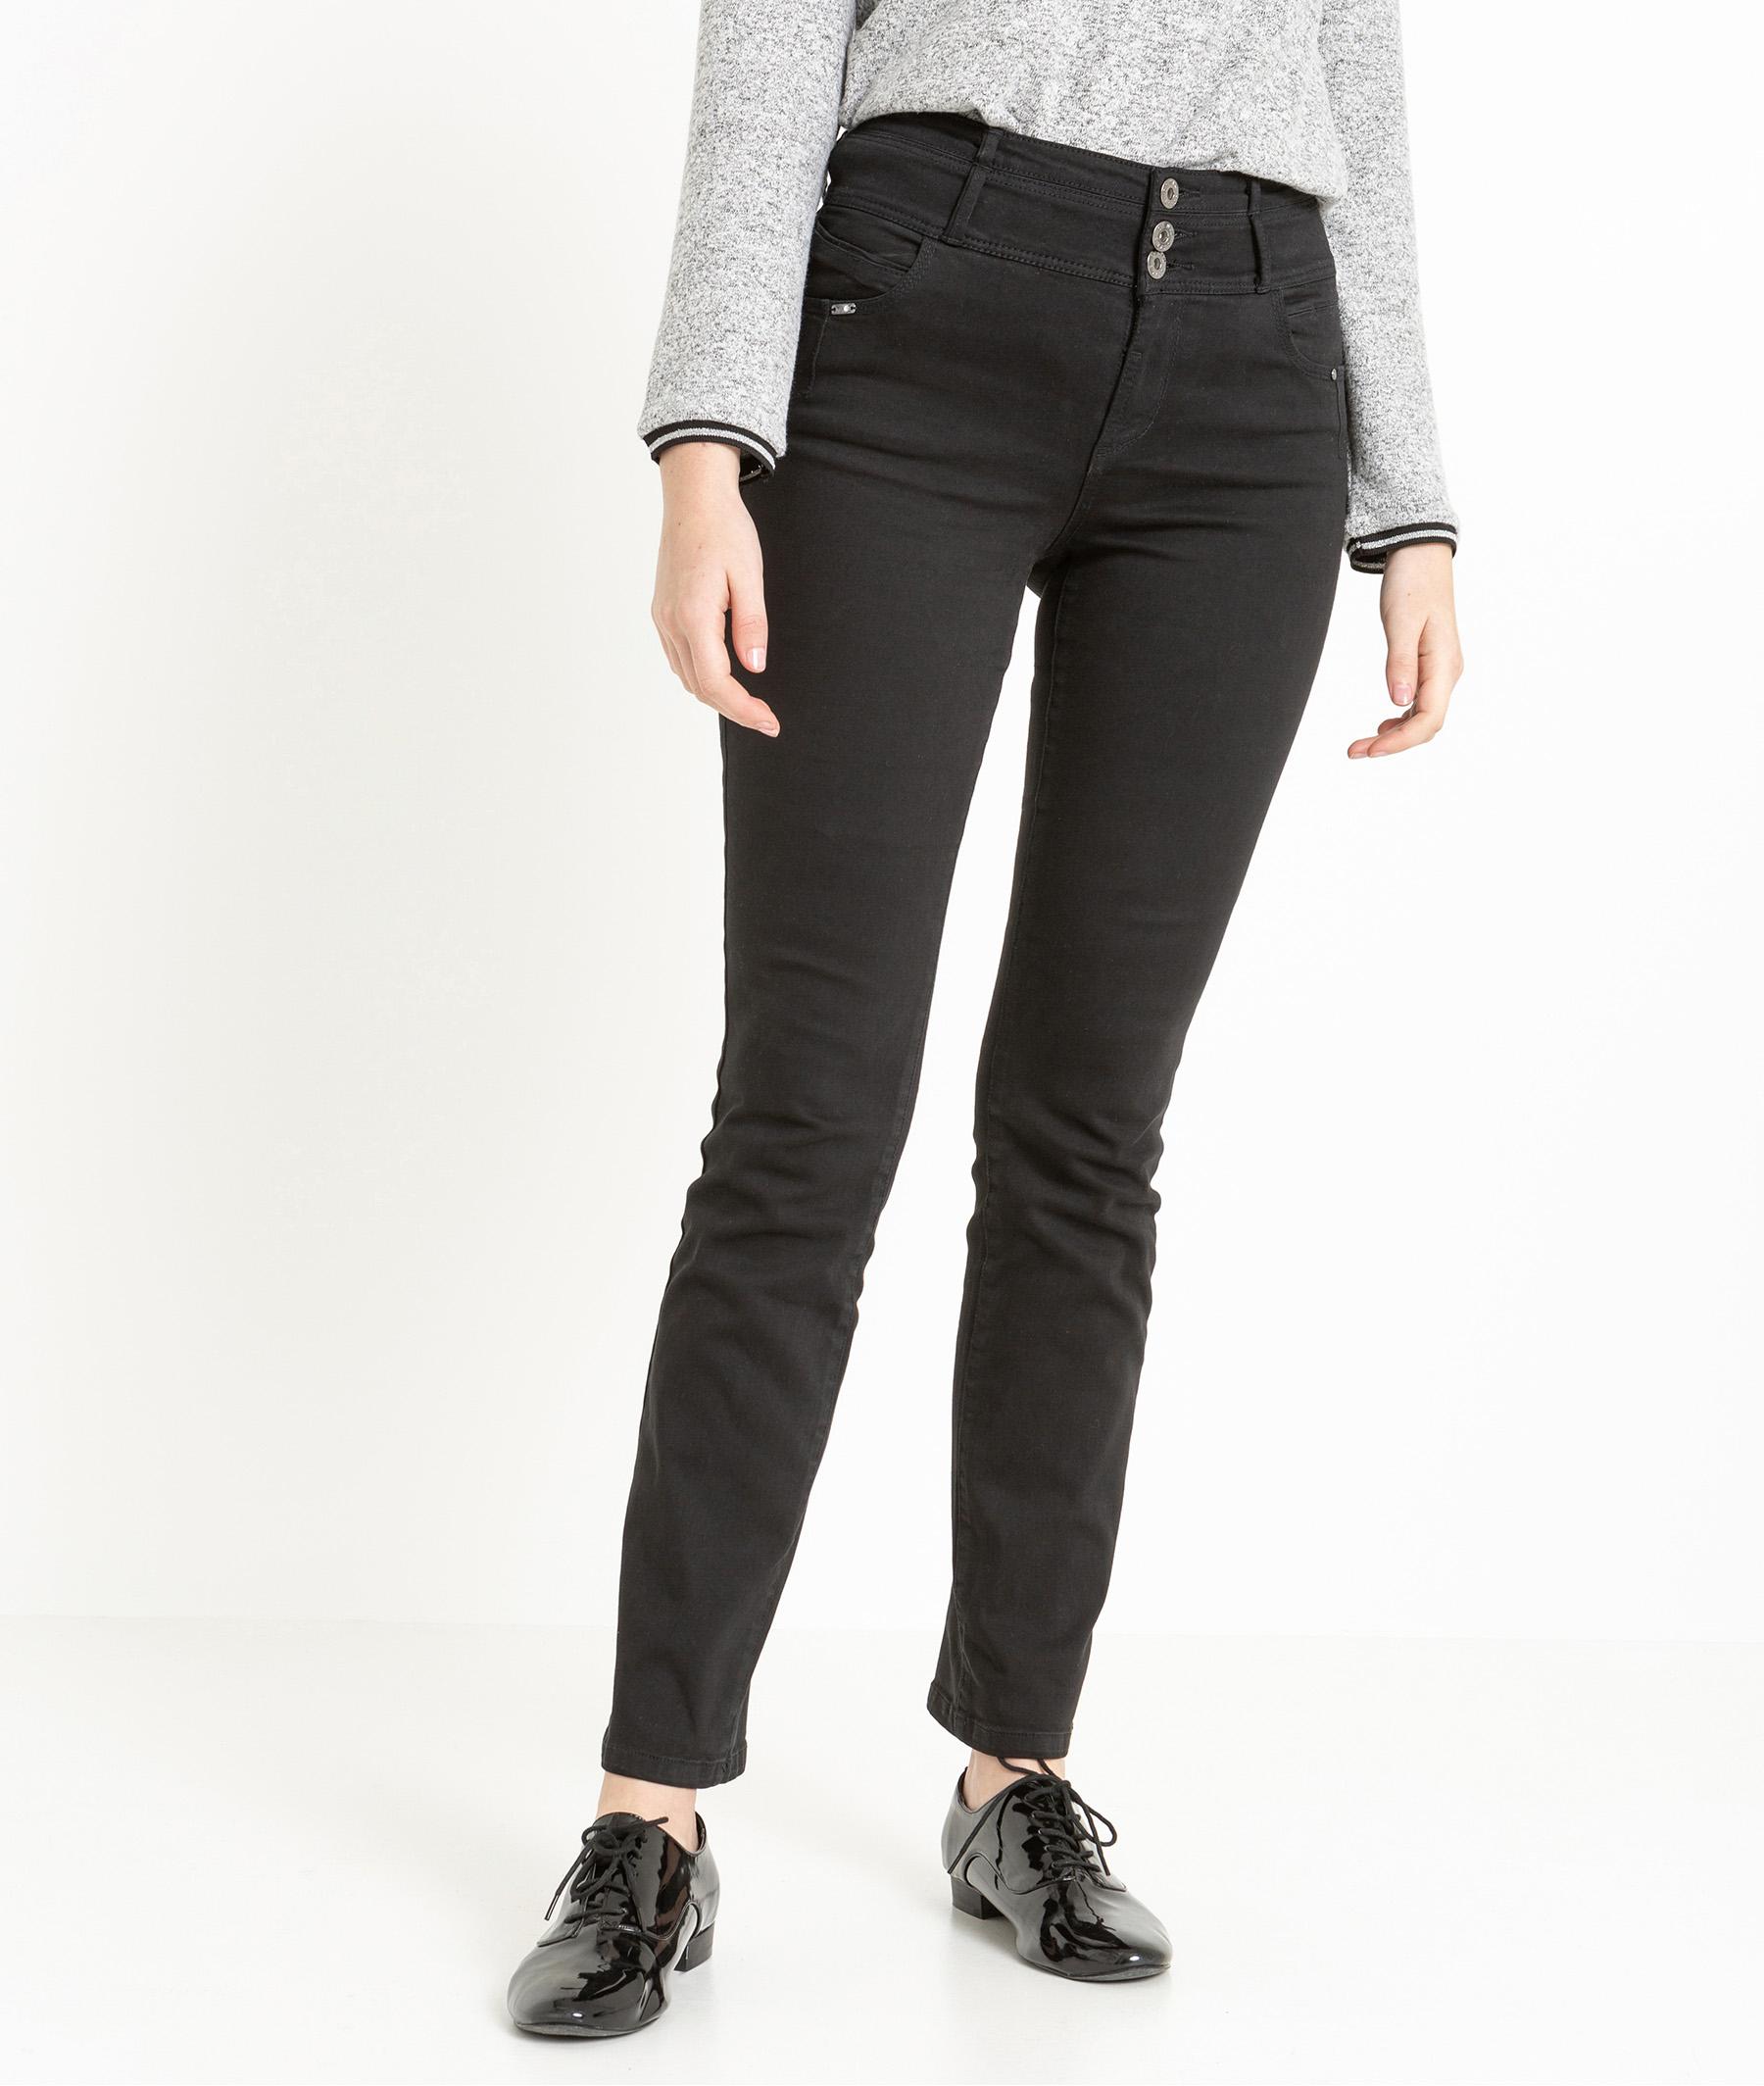 jean femme droit taille haute black grain de malice. Black Bedroom Furniture Sets. Home Design Ideas